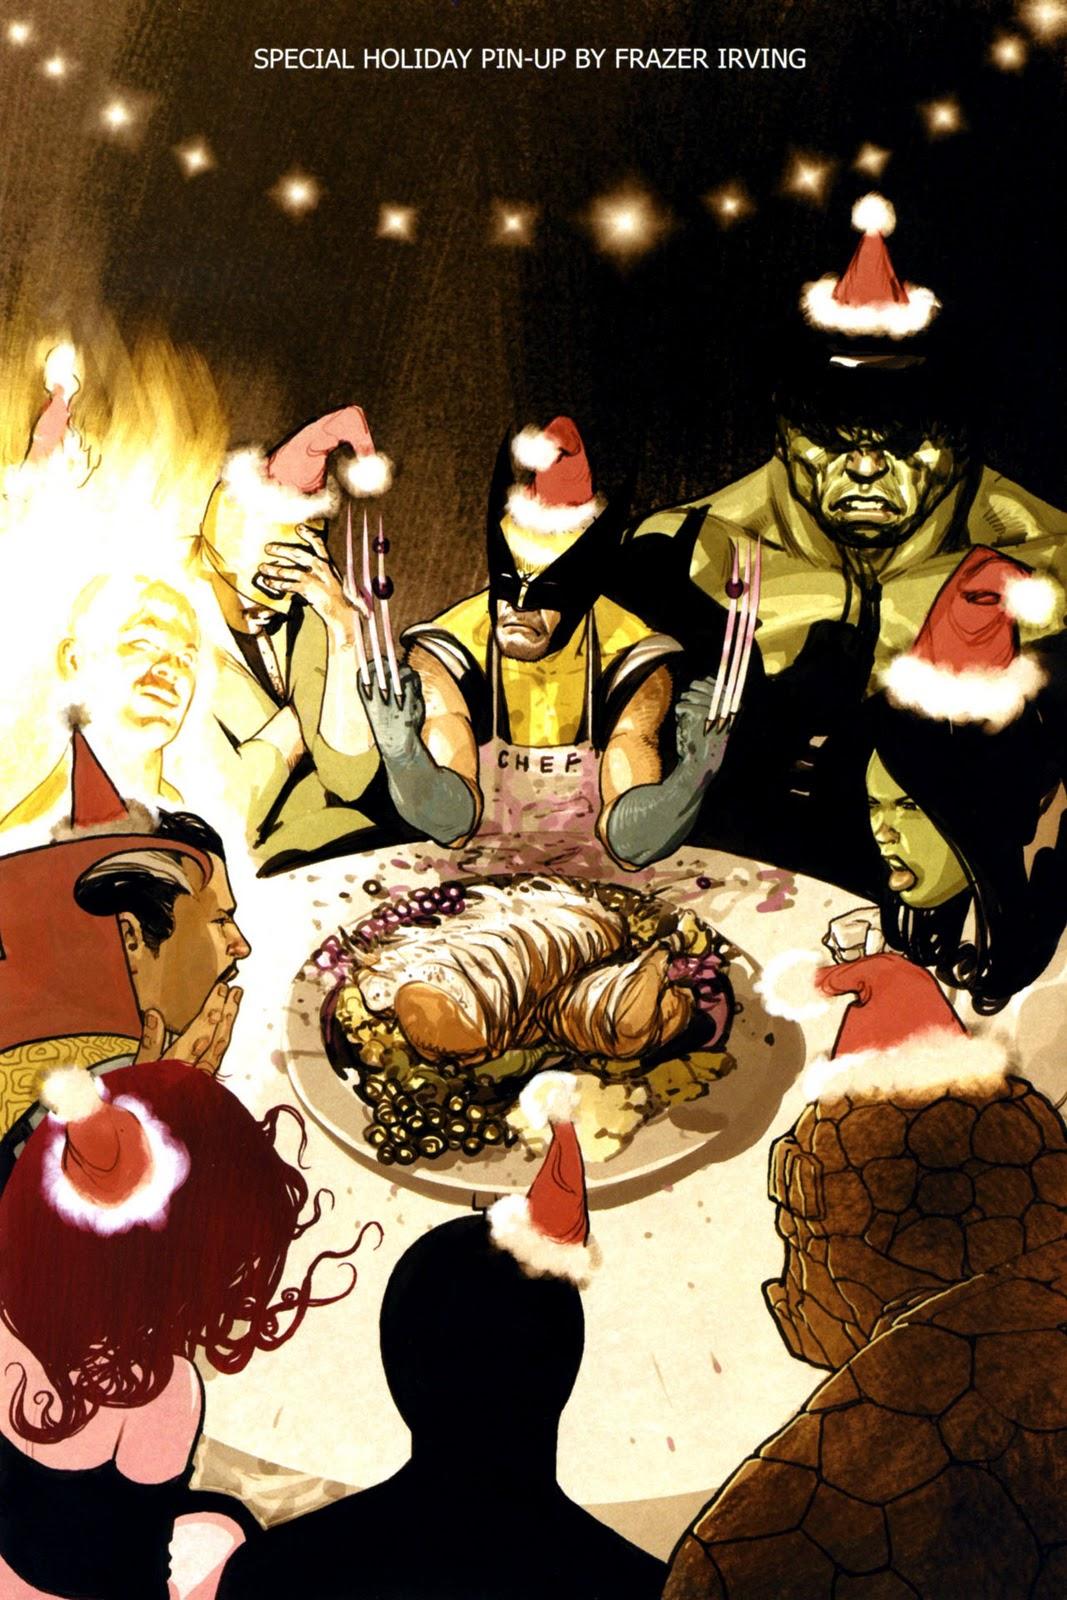 http://2.bp.blogspot.com/-A1Yw7mbEH7g/TuEgDEA6KjI/AAAAAAAABsM/uJHkQb0rtXM/s1600/Marvel+Holiday+Special+2008+031.jpg